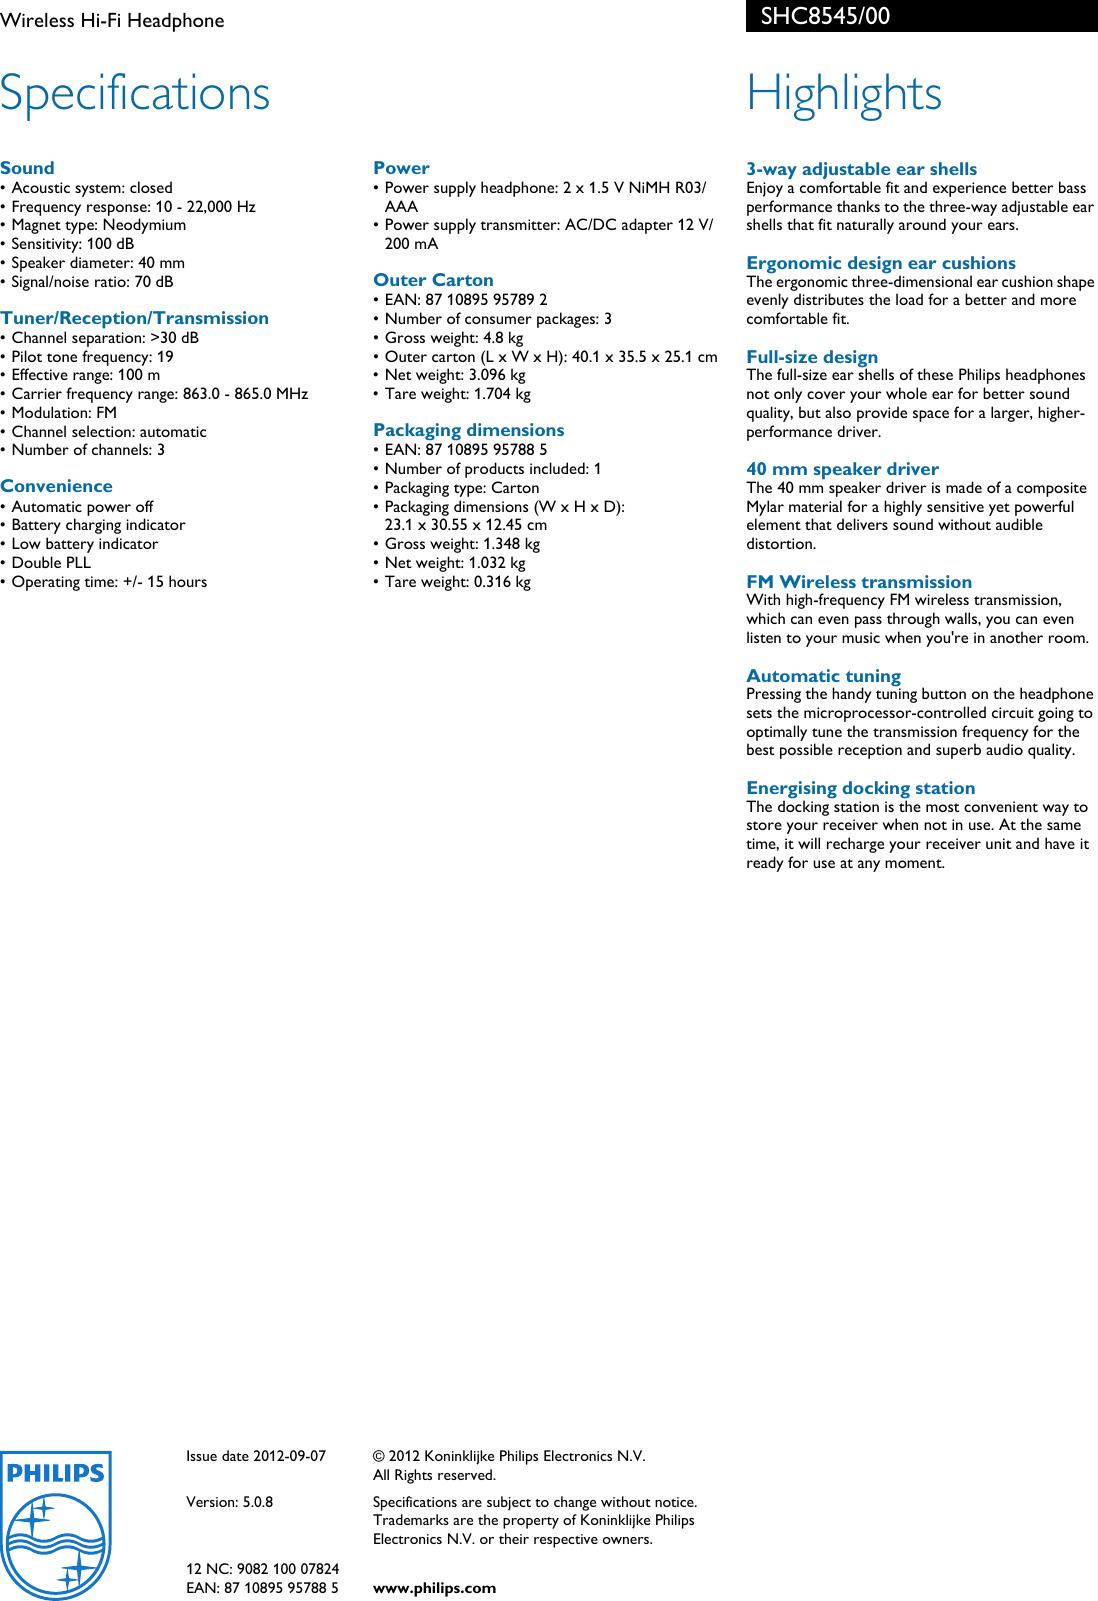 Philips Shc8545 00 Wireless Hi Fi Headphone User Manual Leaflet Low Battery Indicator Circuit Page 2 Of